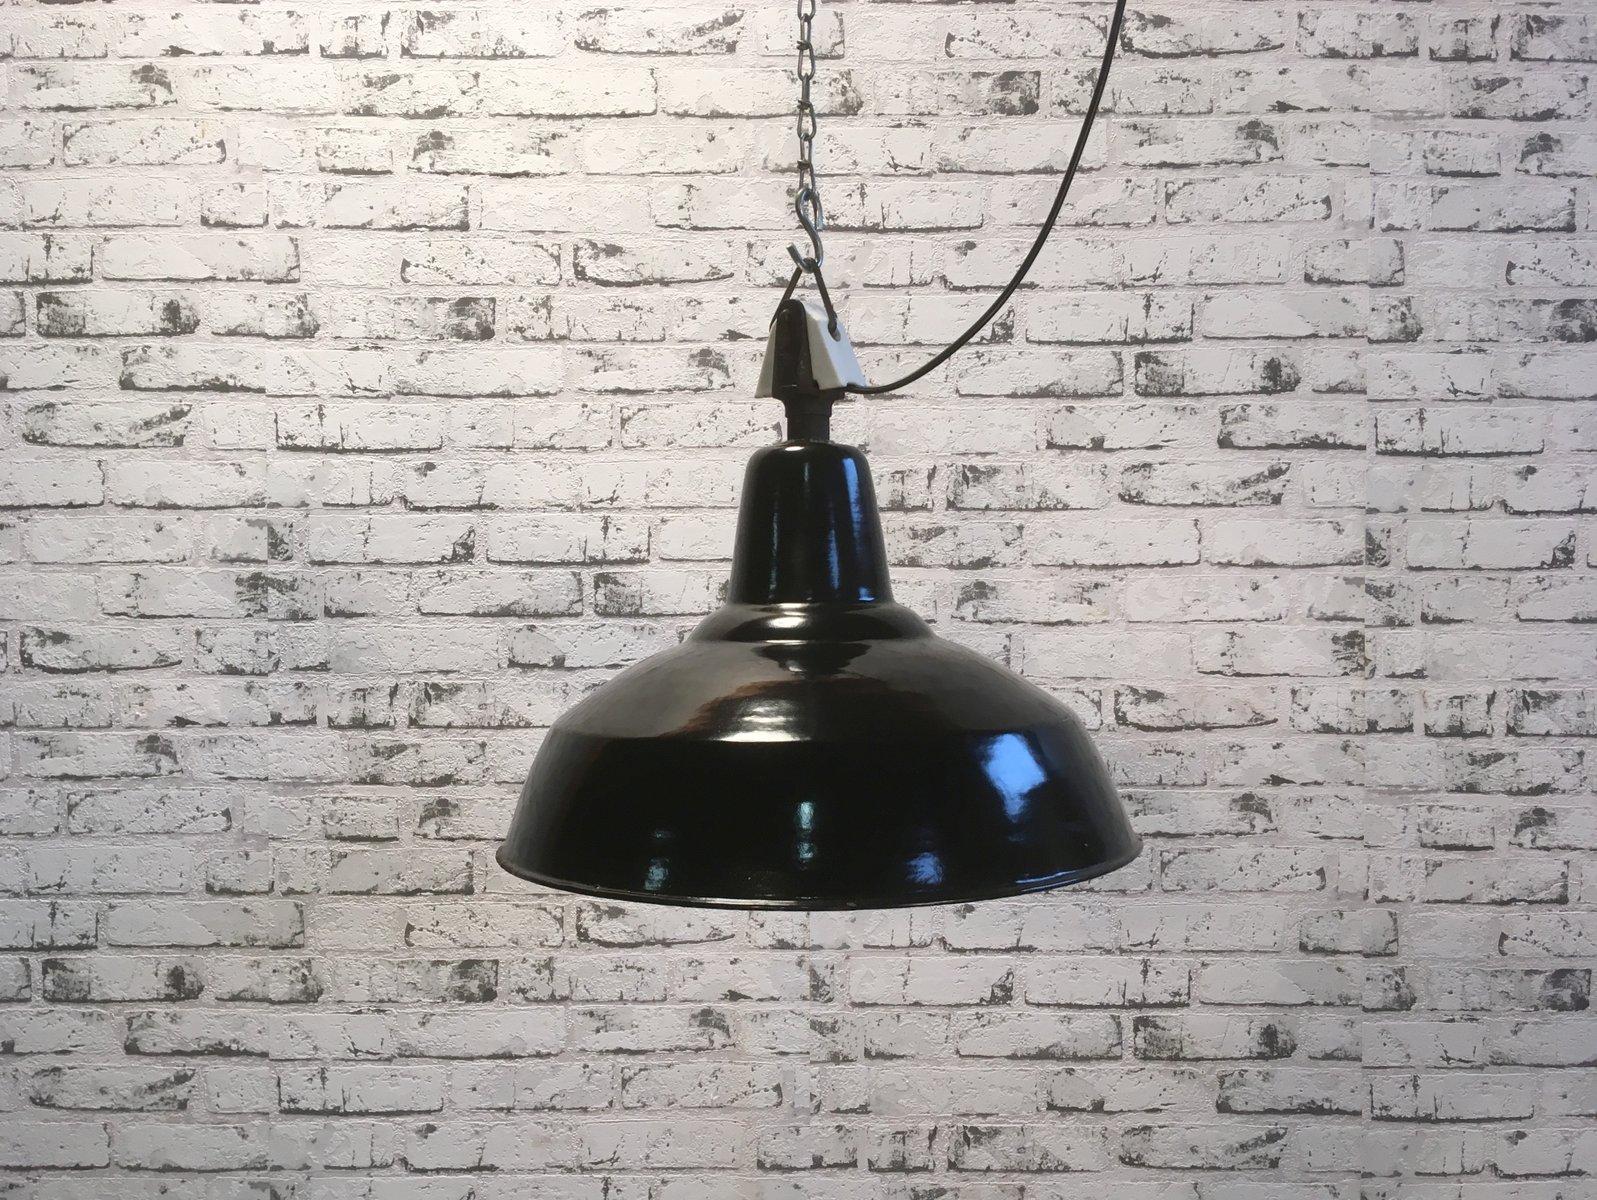 Industrielle vintage lampe mit porzellanteil 1950er bei pamono kaufen - Lampe vintage industrielle ...